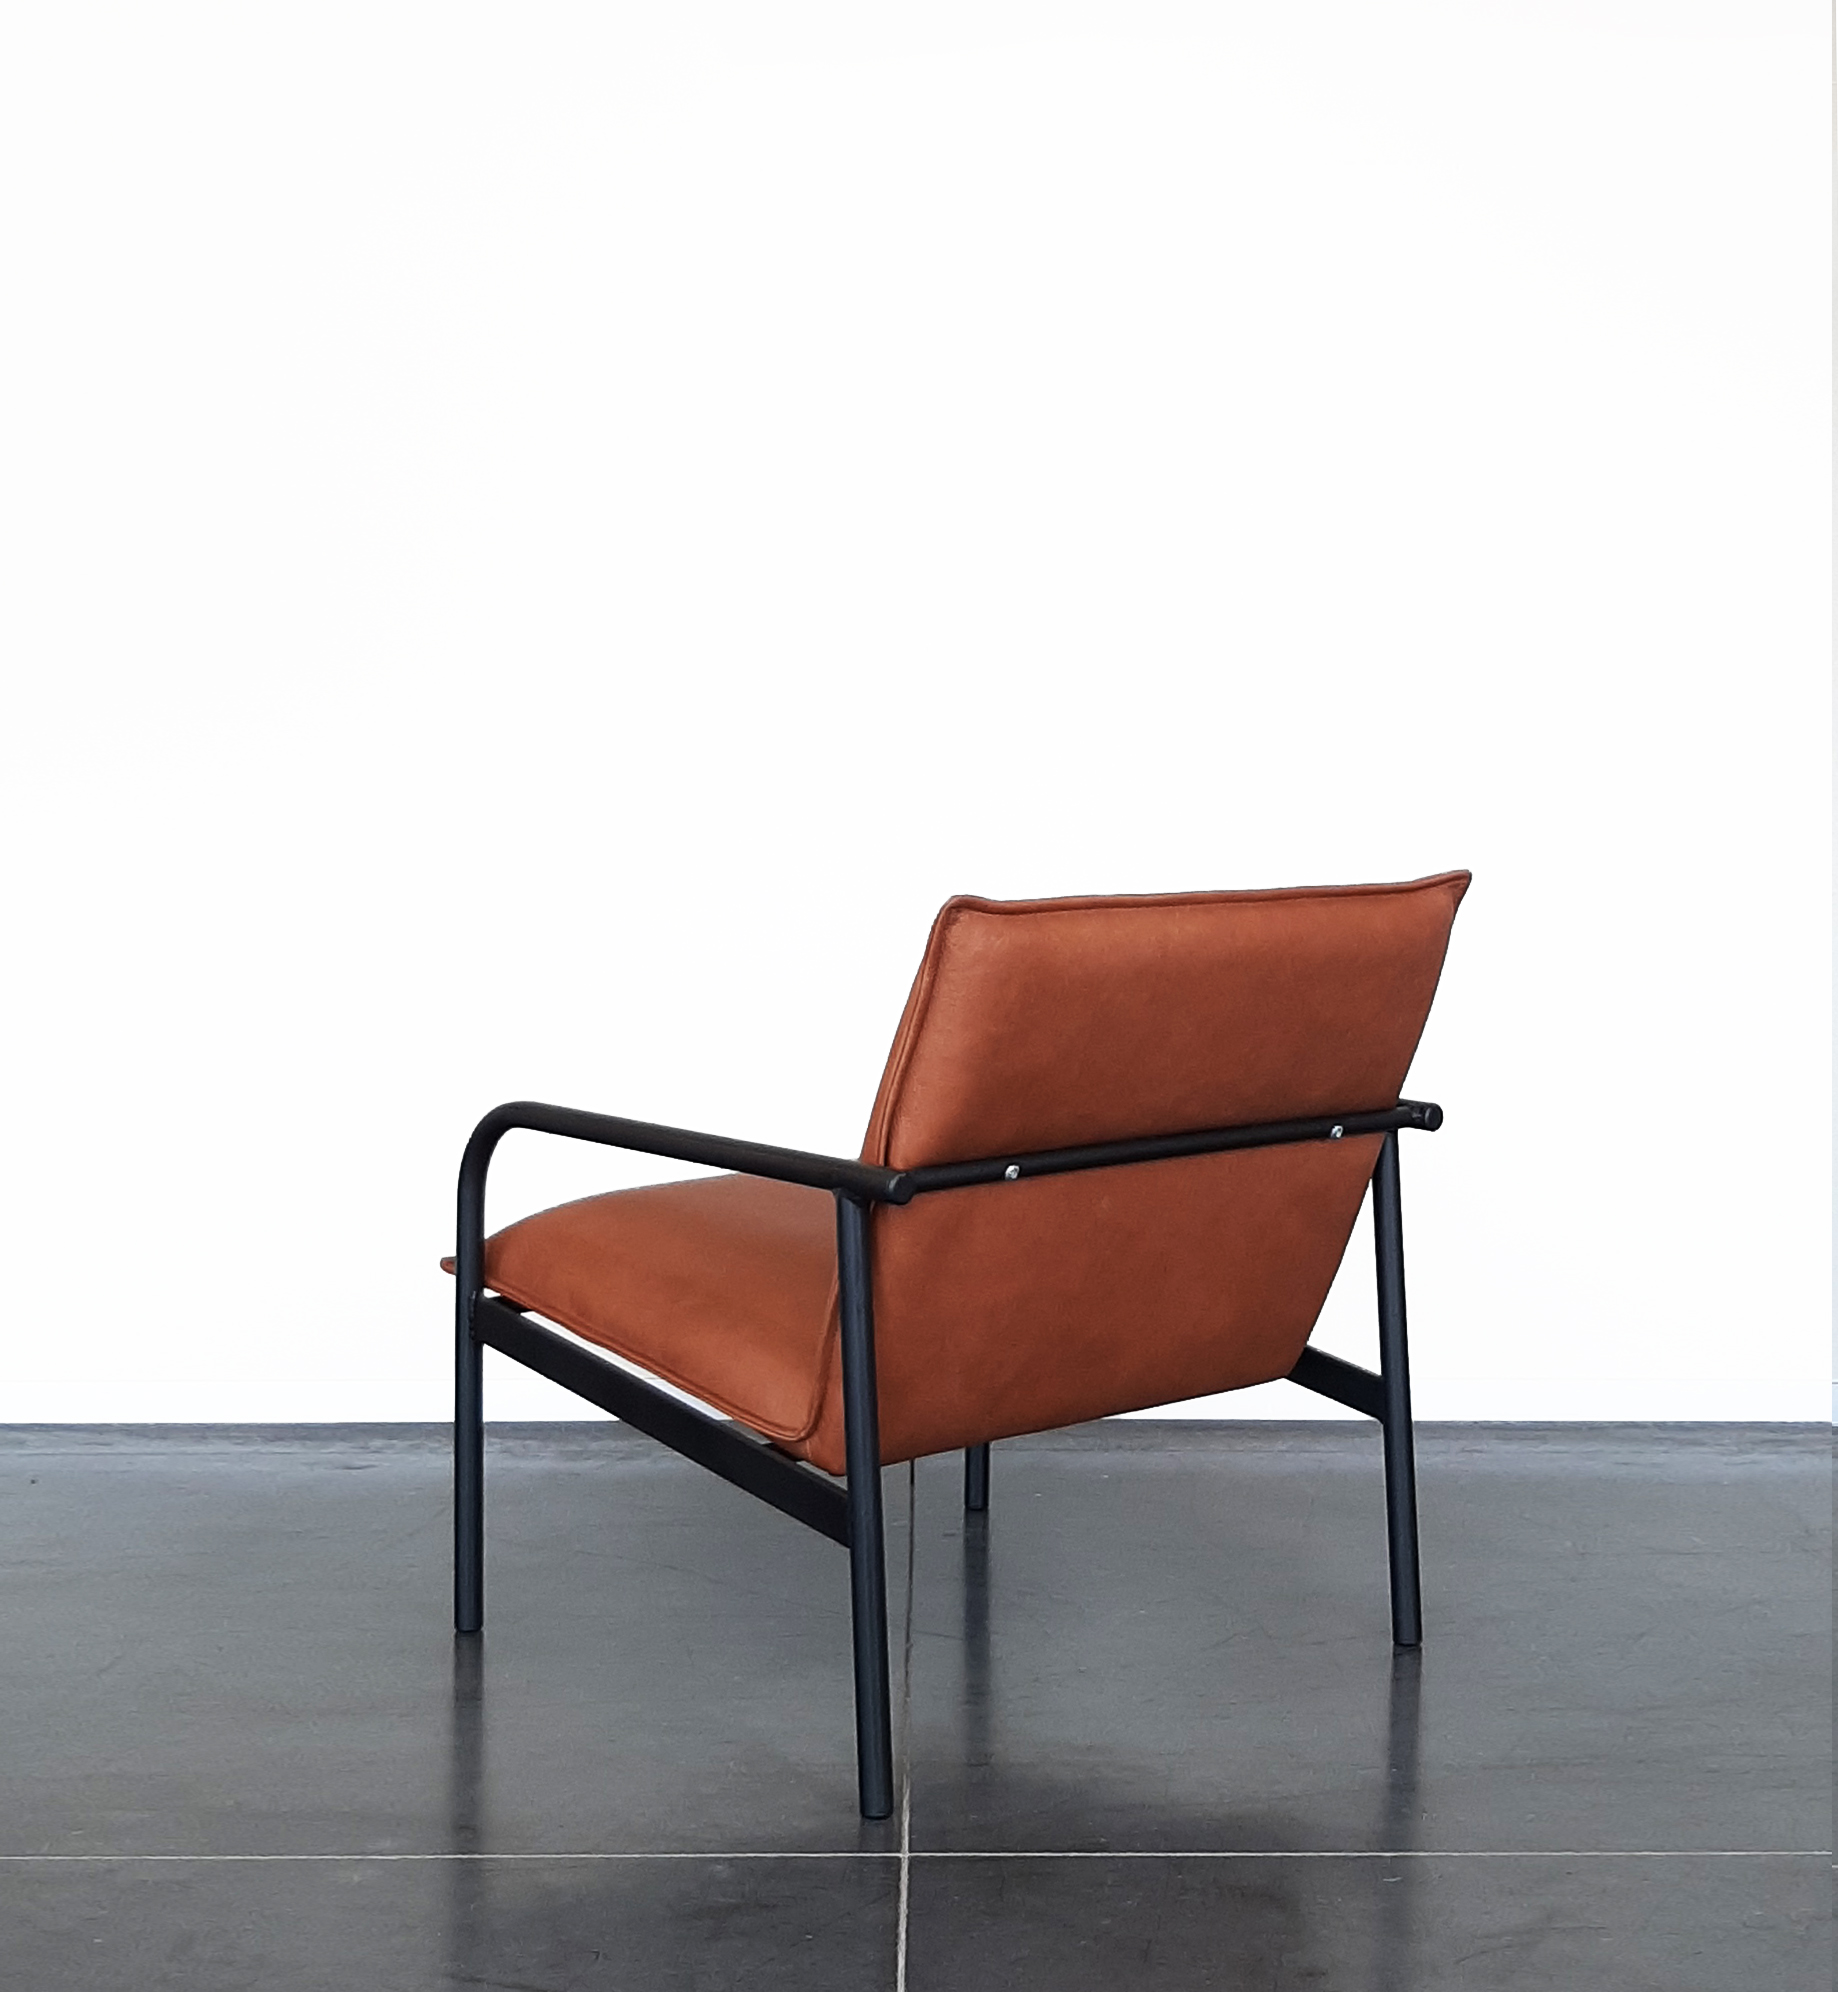 6 Witte Design Stoelen.Evolution Design Meubelen Club Fauteuil Design Meubelen